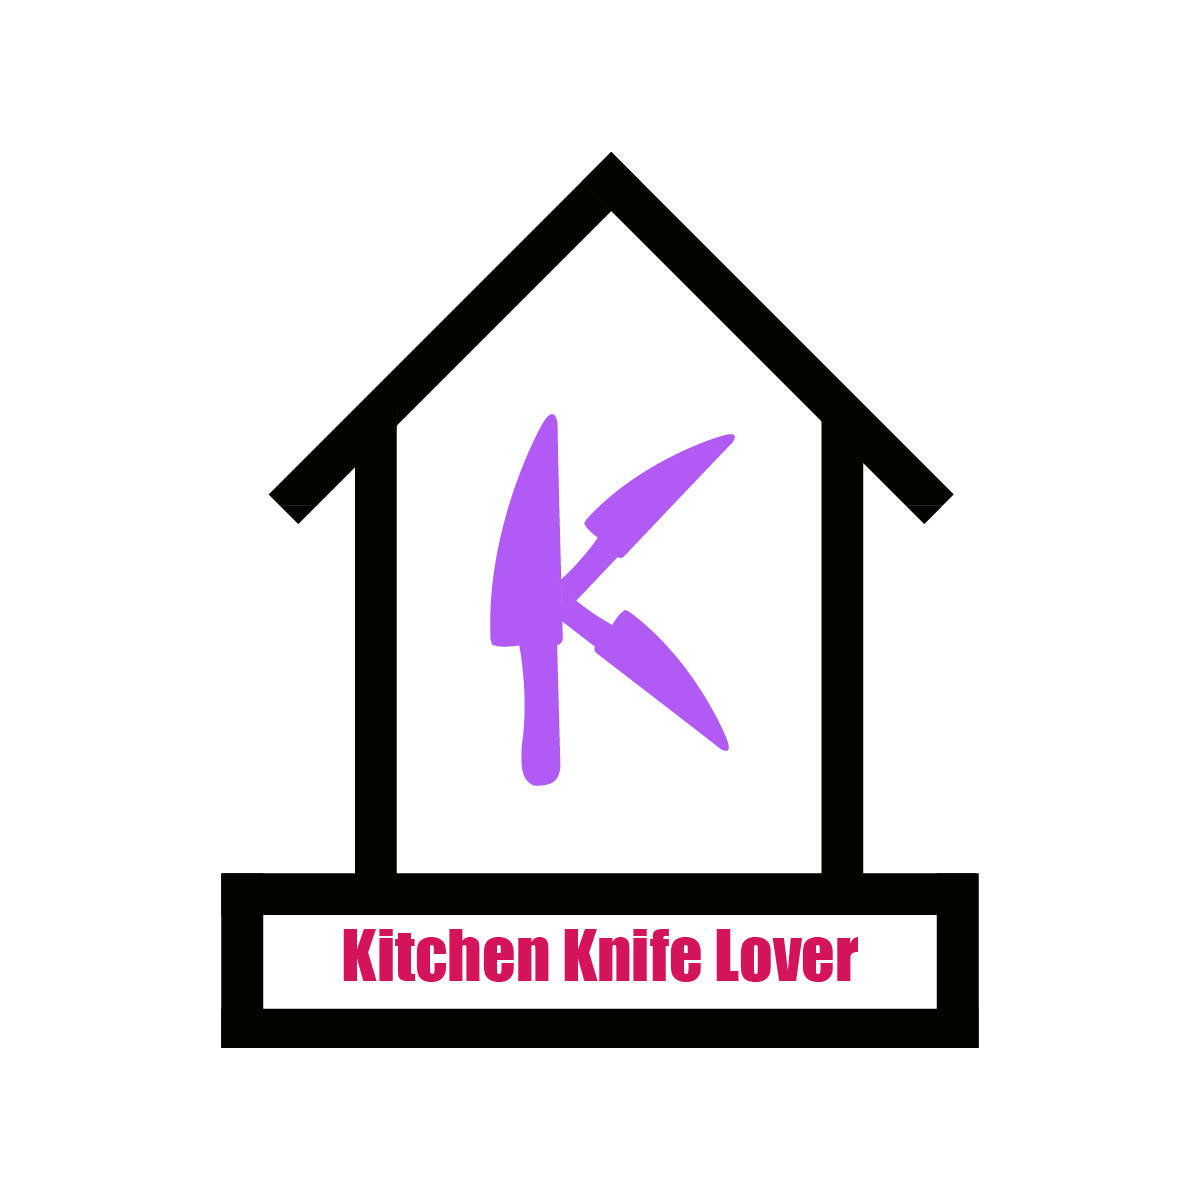 kitchenknifelover.com/